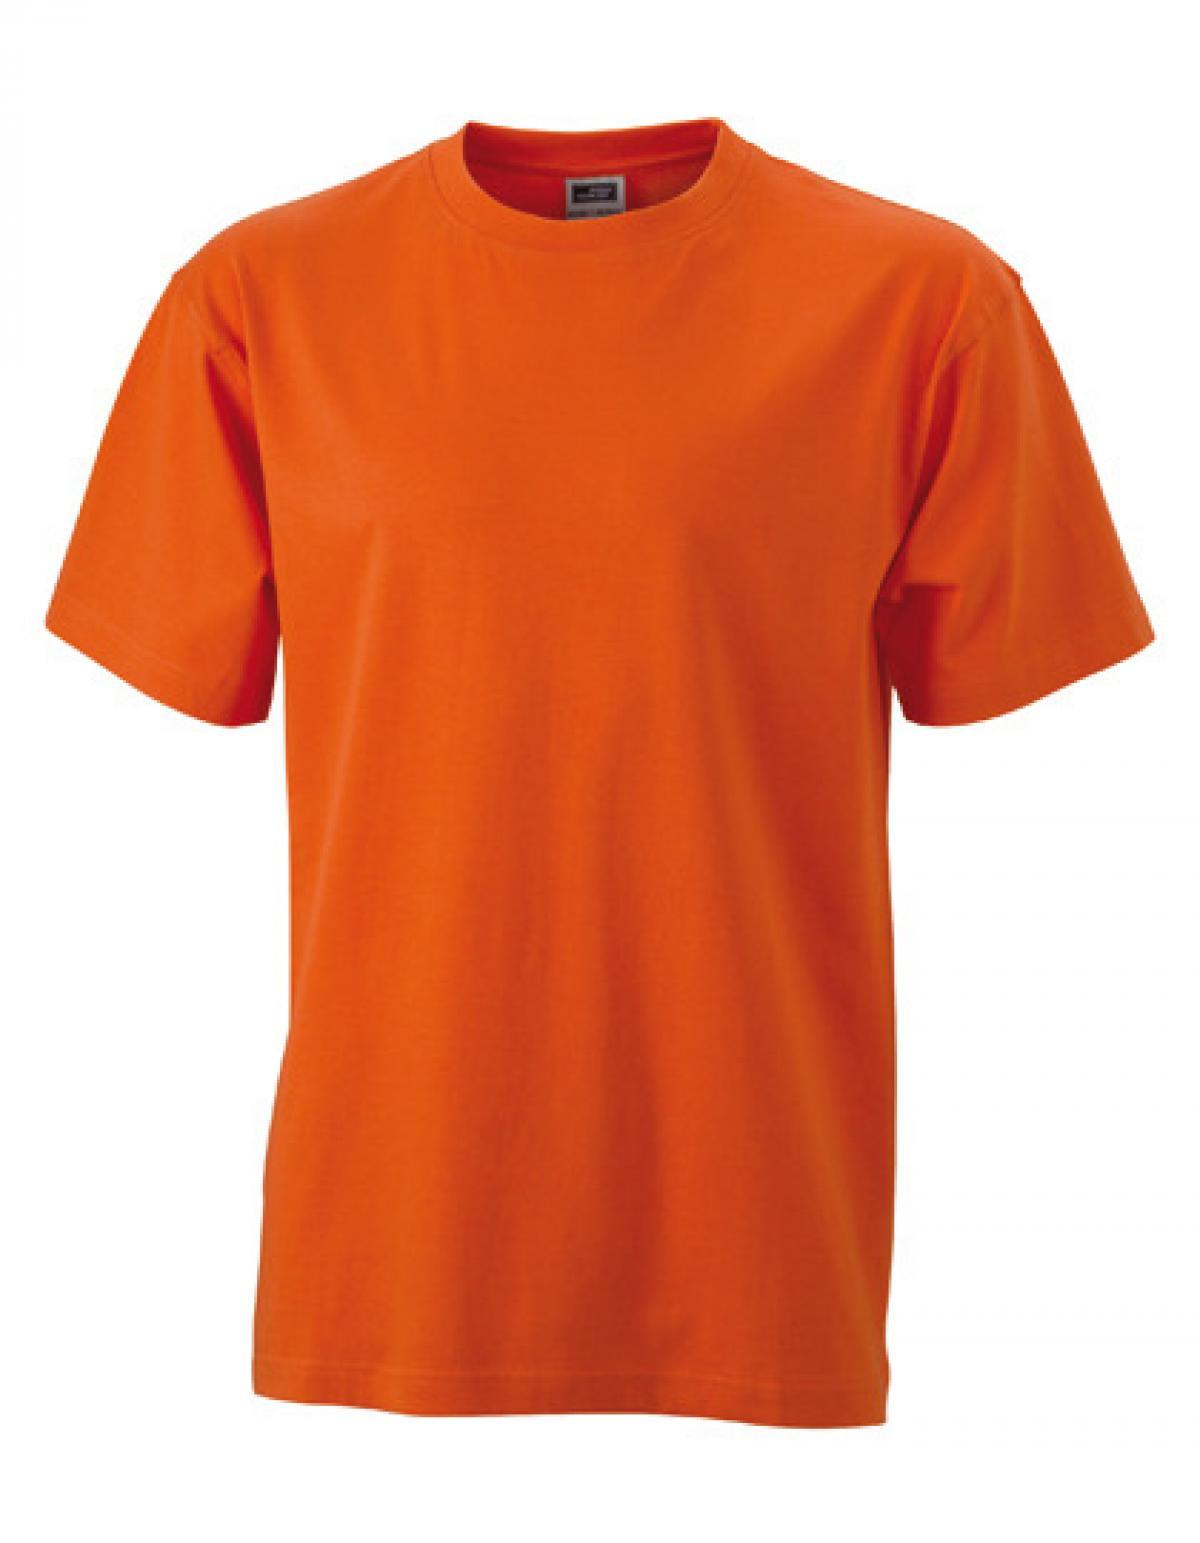 herren rundhals komfort t shirt single jersey rexlander s. Black Bedroom Furniture Sets. Home Design Ideas